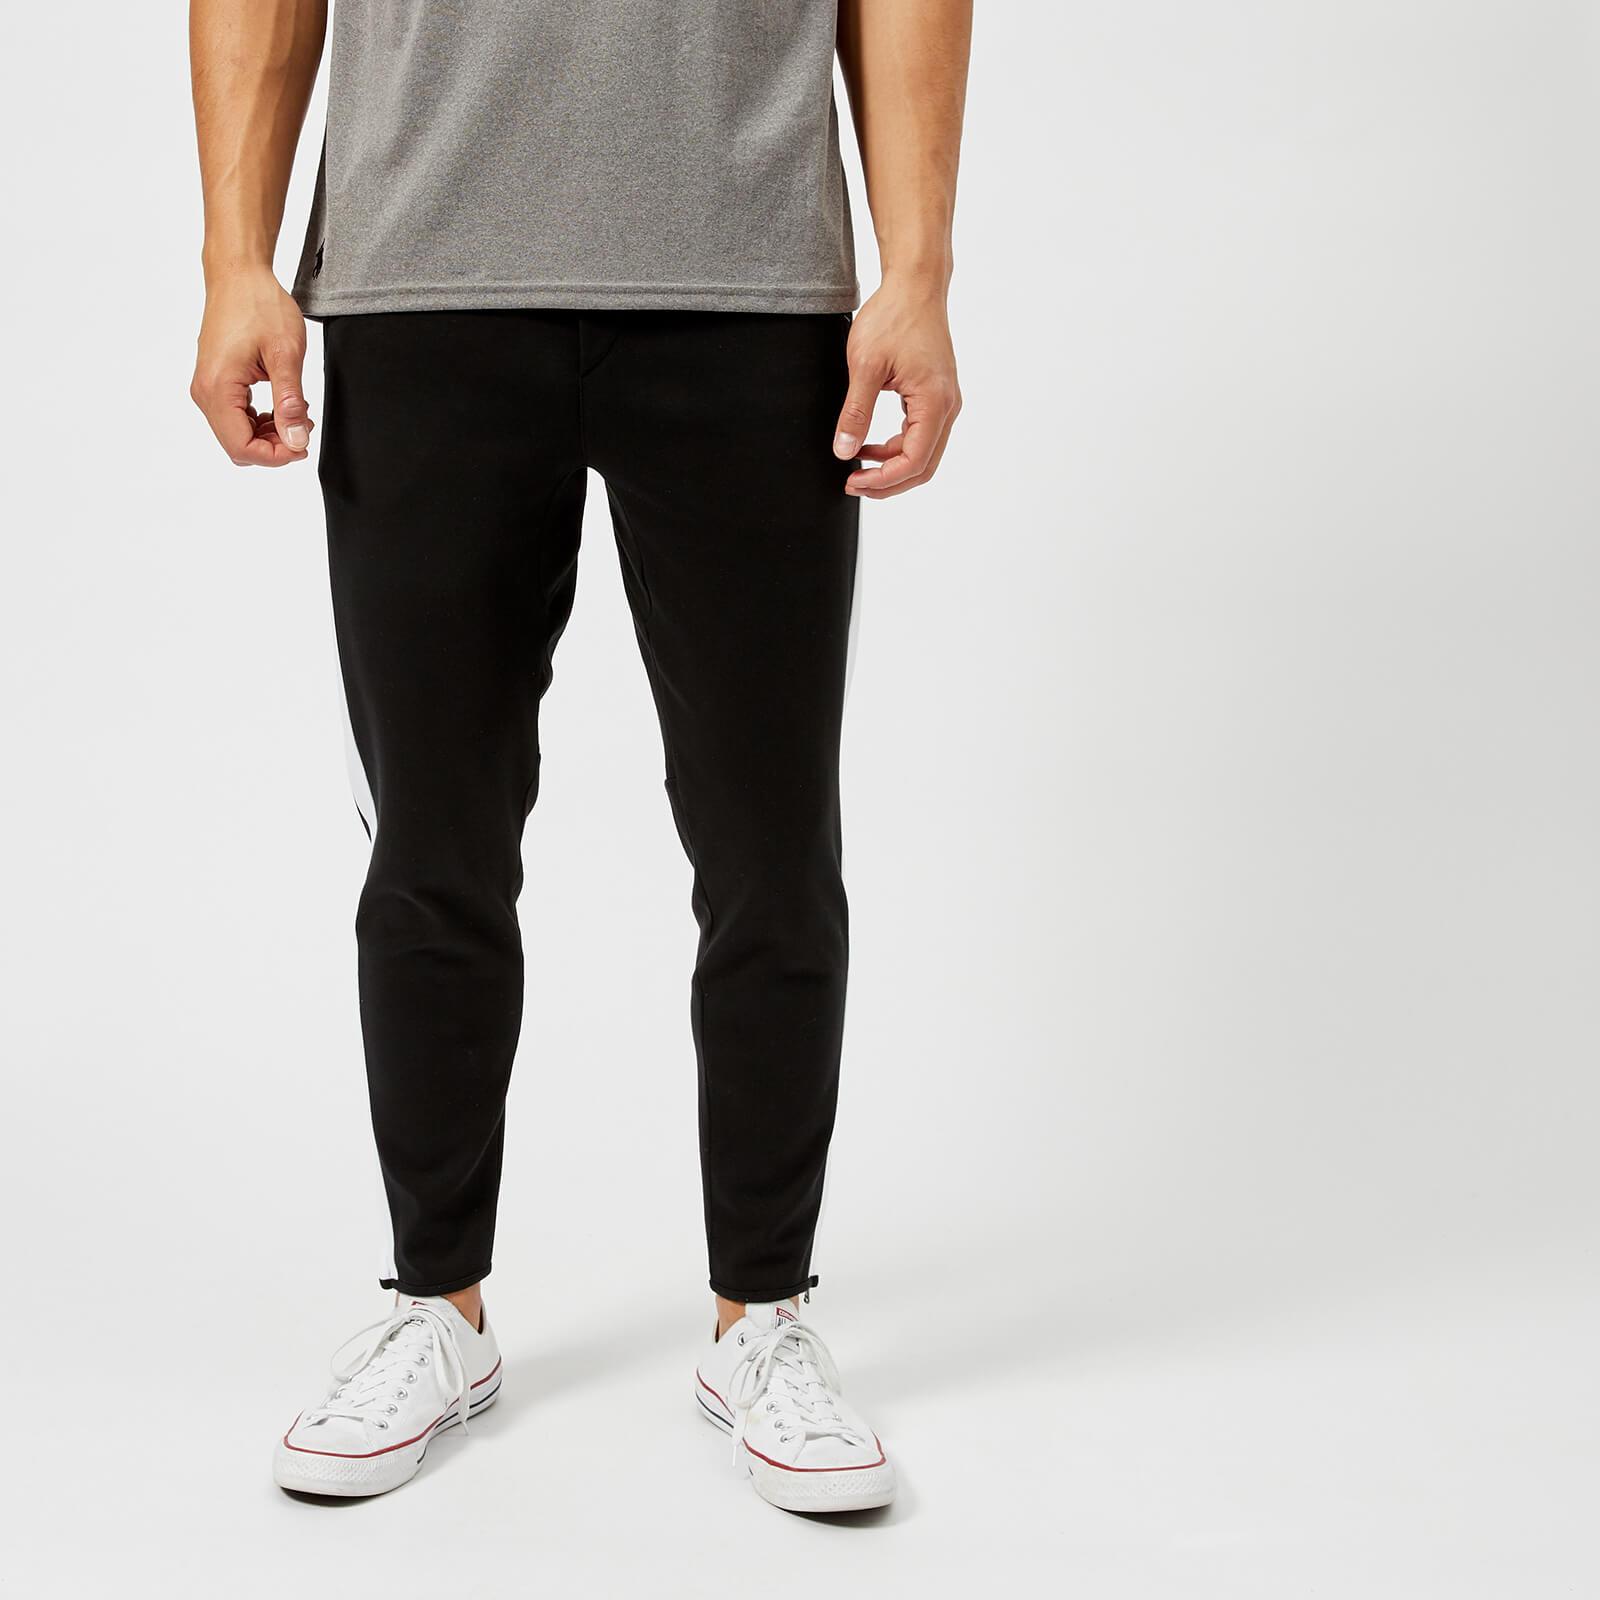 15edd8df6 Polo Ralph Lauren Men s Interlock Track Pants - Polo Black - Free UK  Delivery over £50